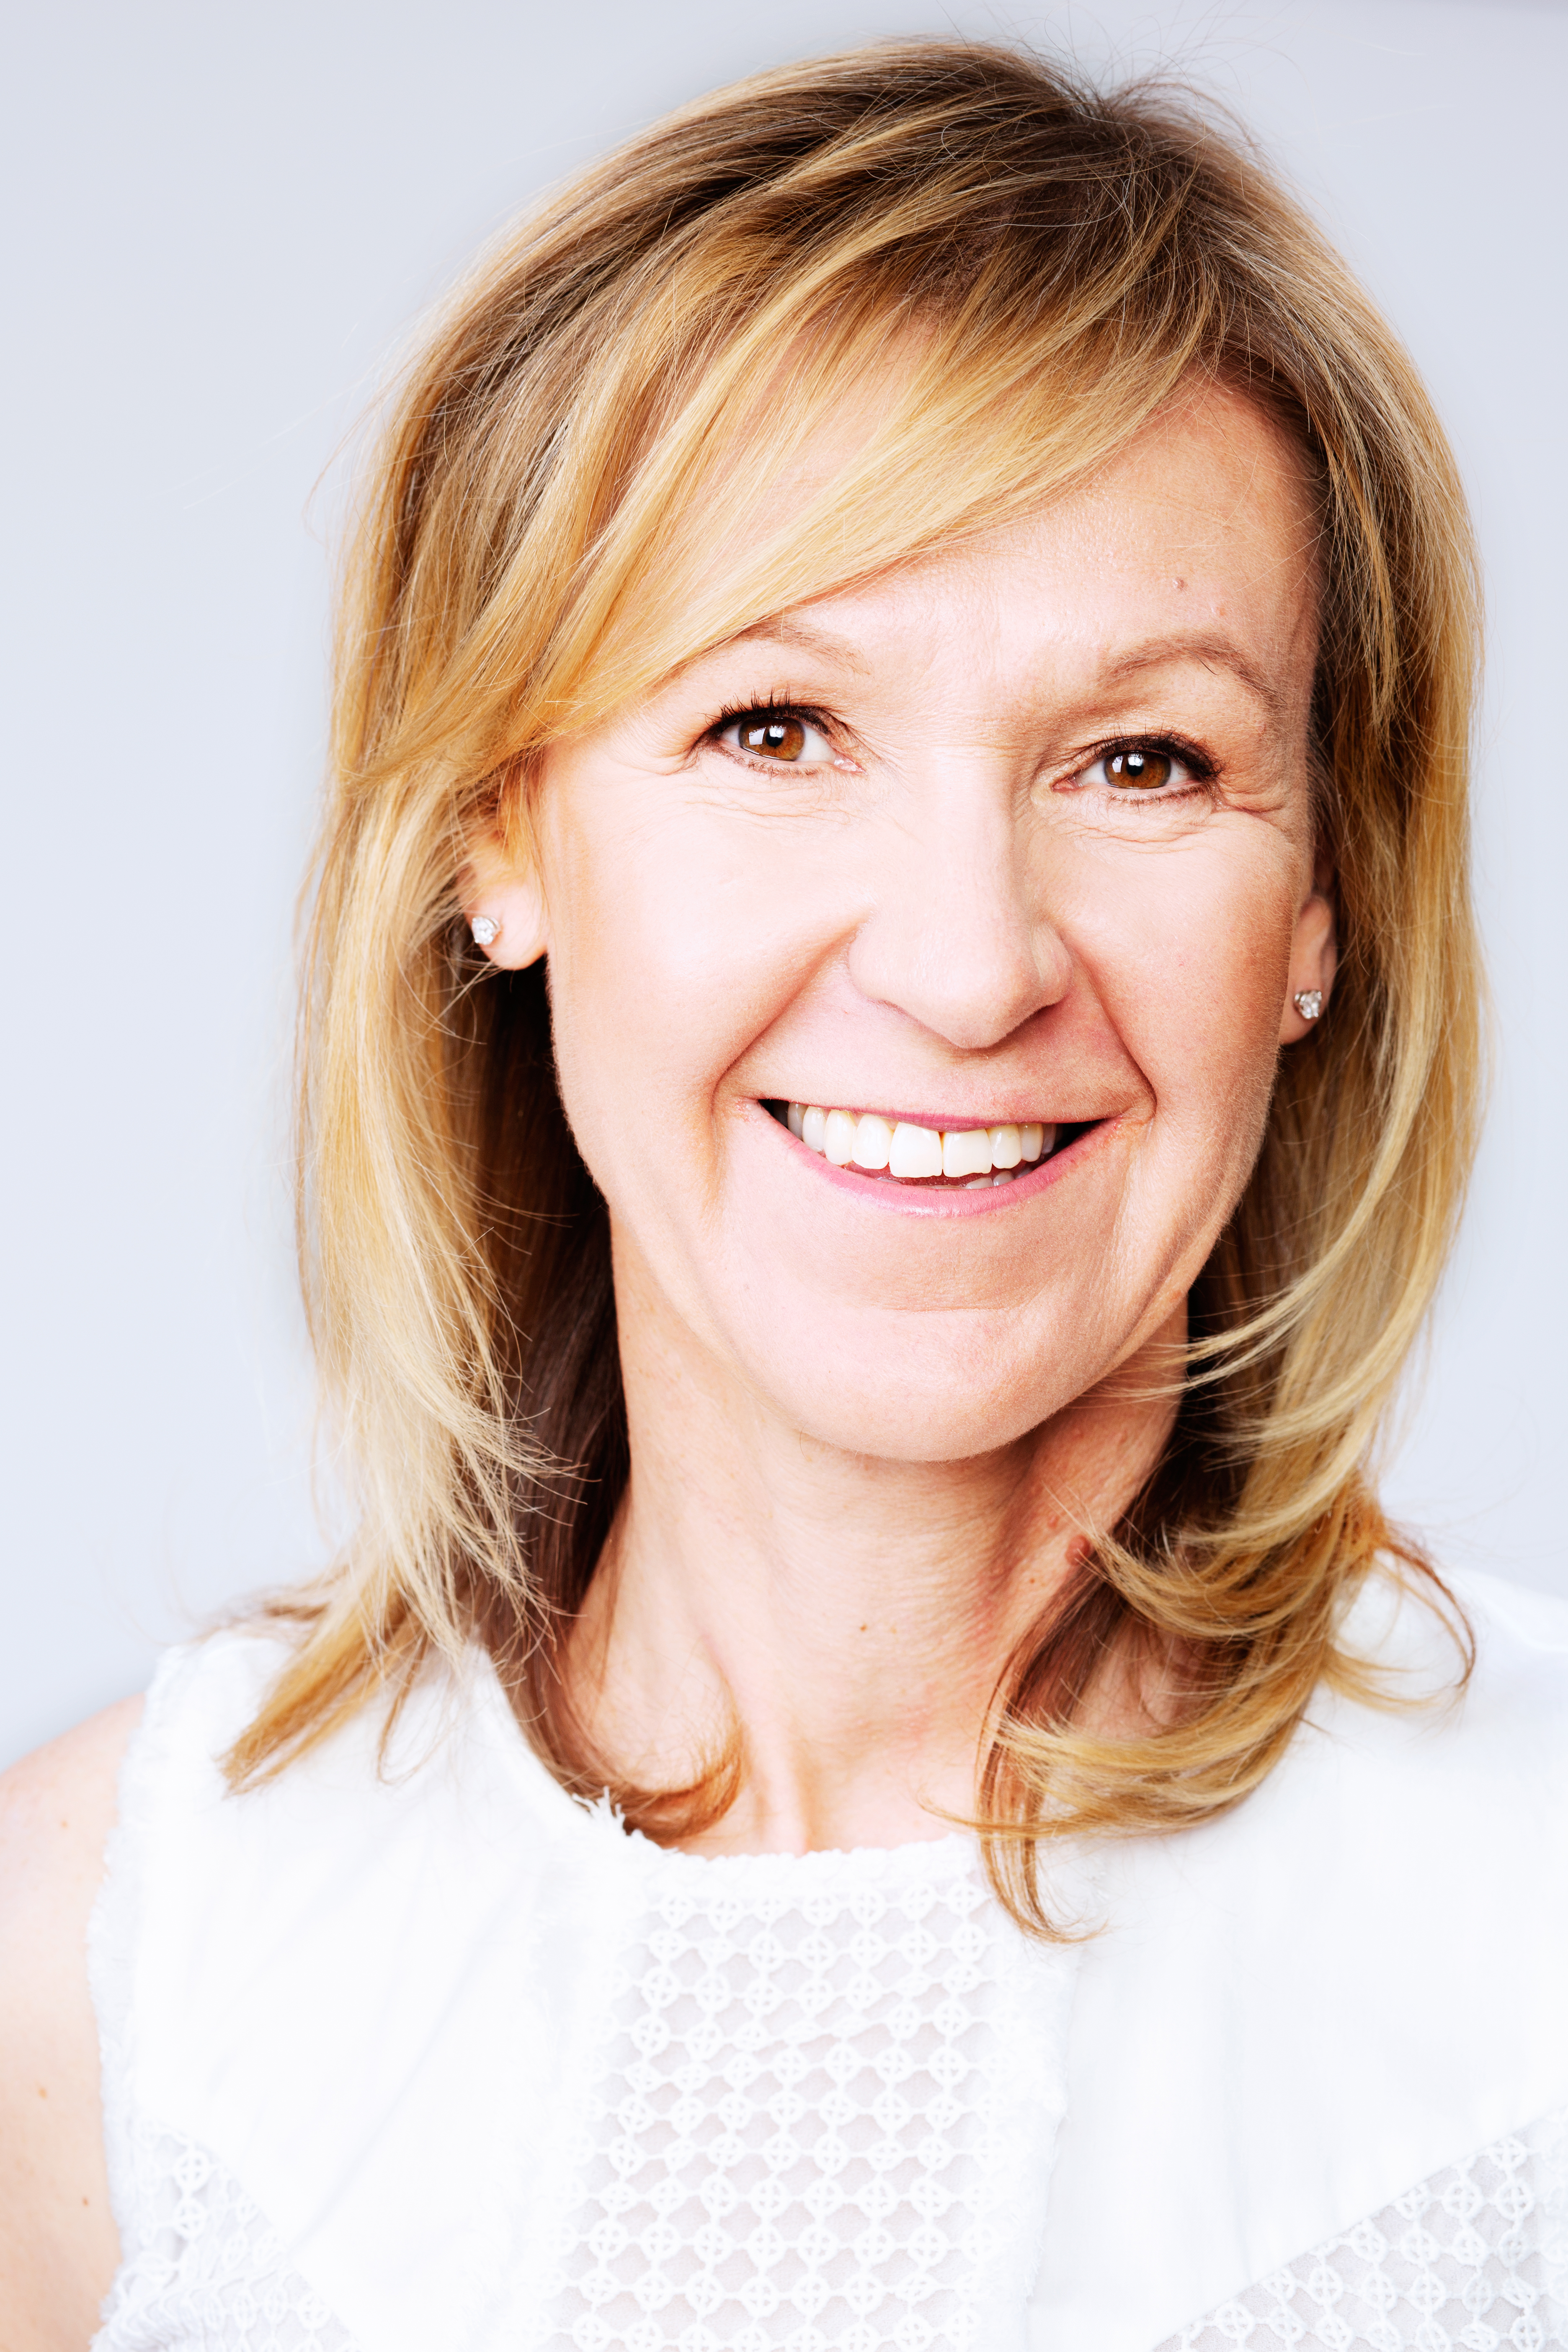 Laura Didyk - Member, Program Committee